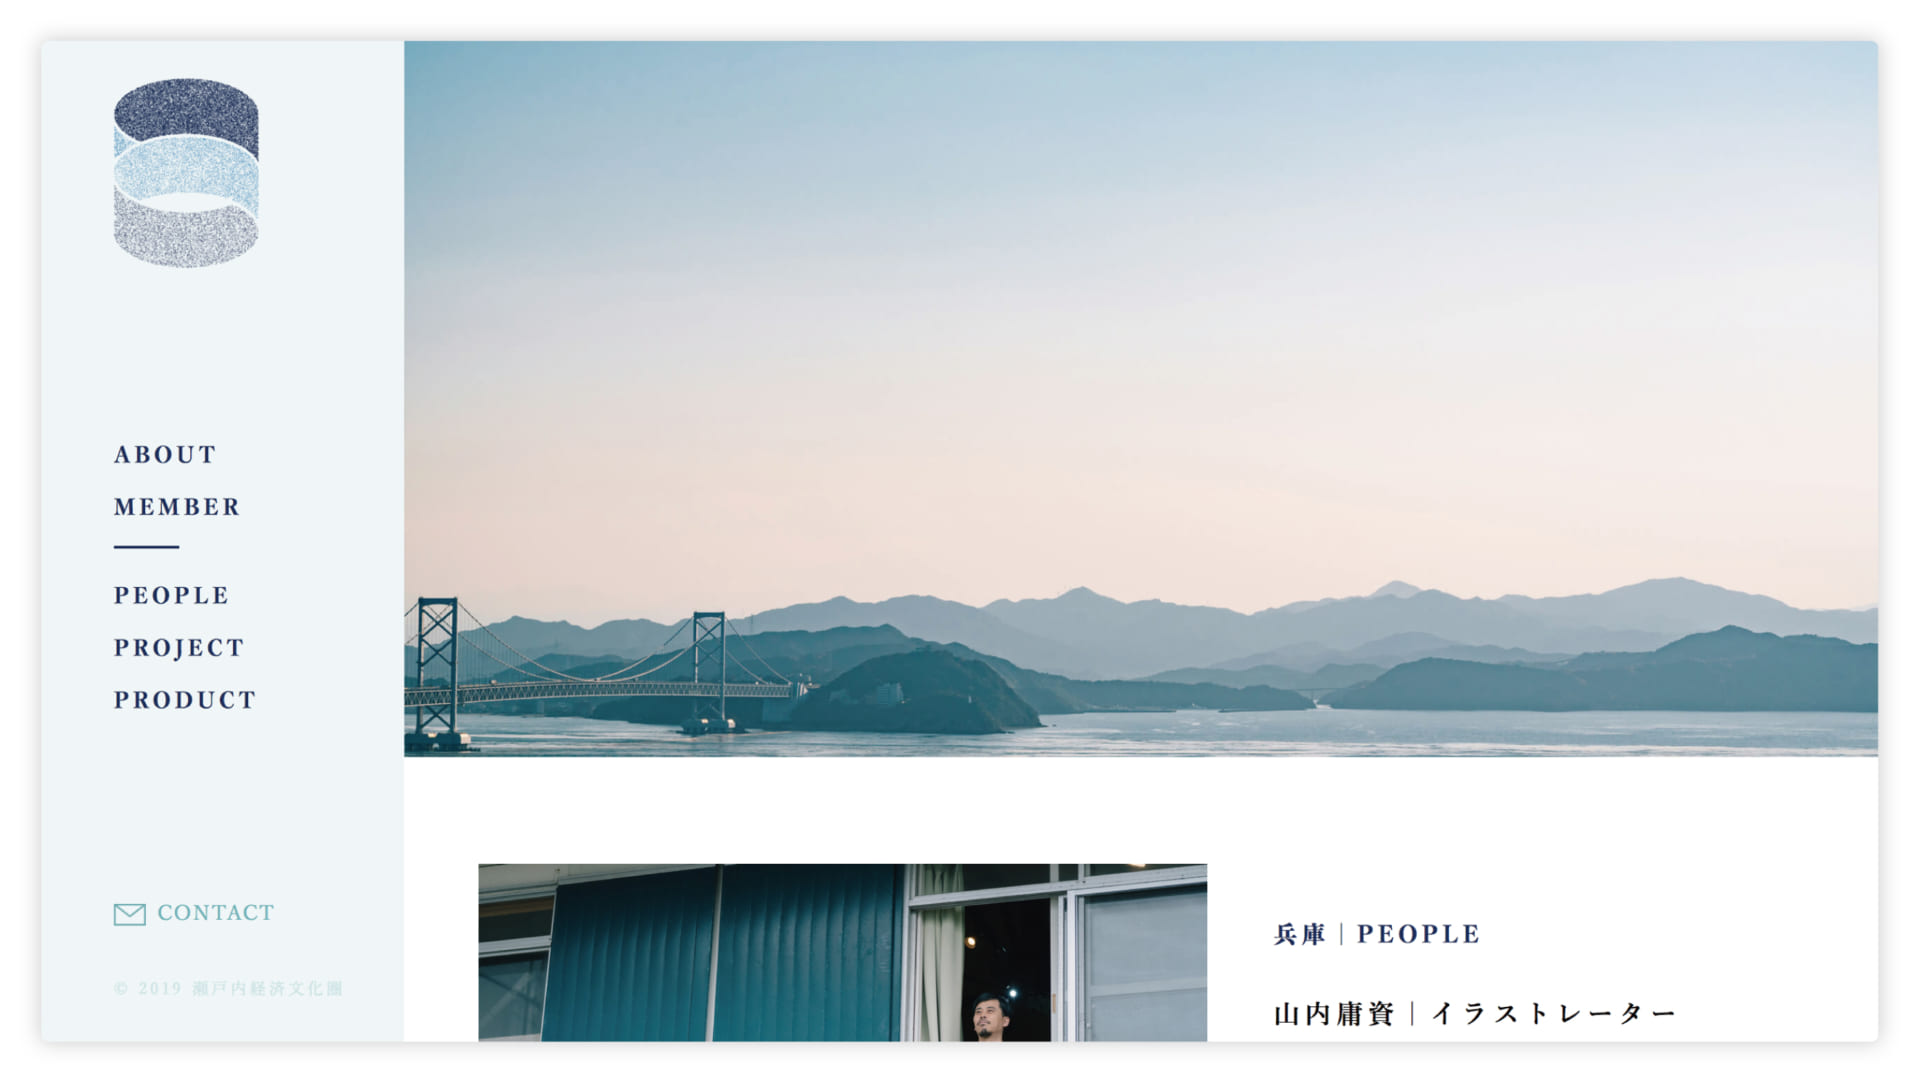 Graf 代表・服部滋樹とUMA / Design Farm 代表・原田祐馬が ディレクターを務める「瀬戸内経済文化